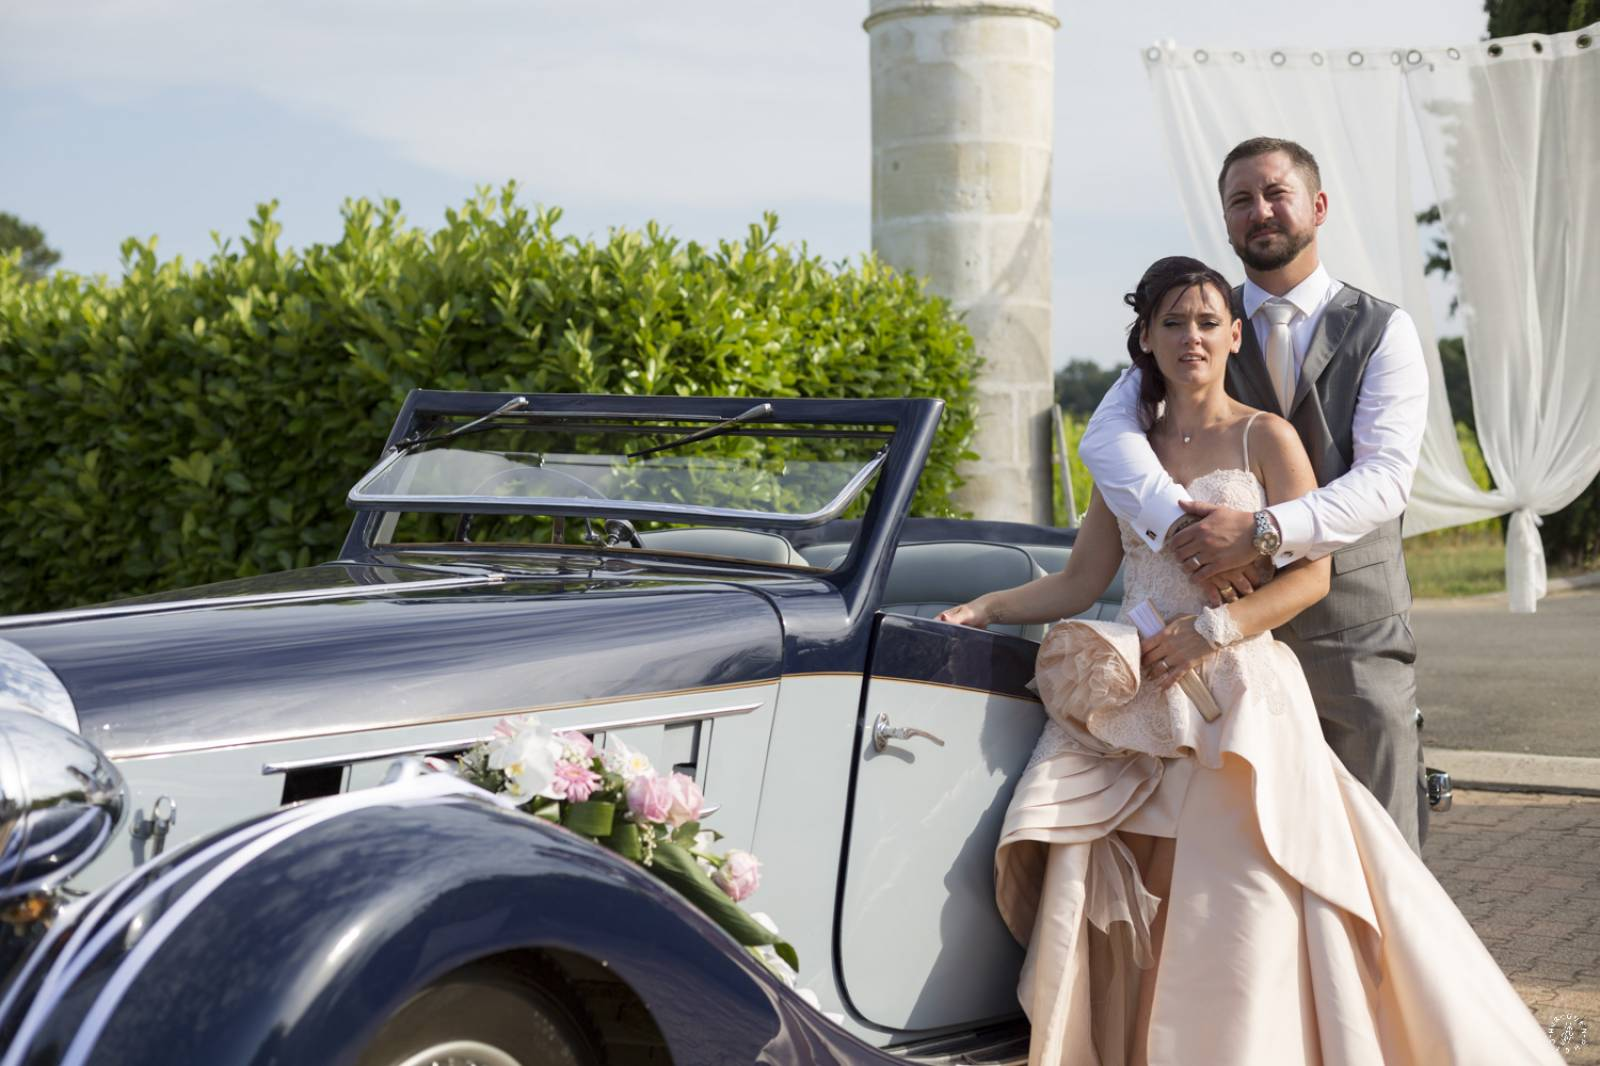 Mariage Charlene Benoit Mariage Chic Et Glamour En Rose Poudre